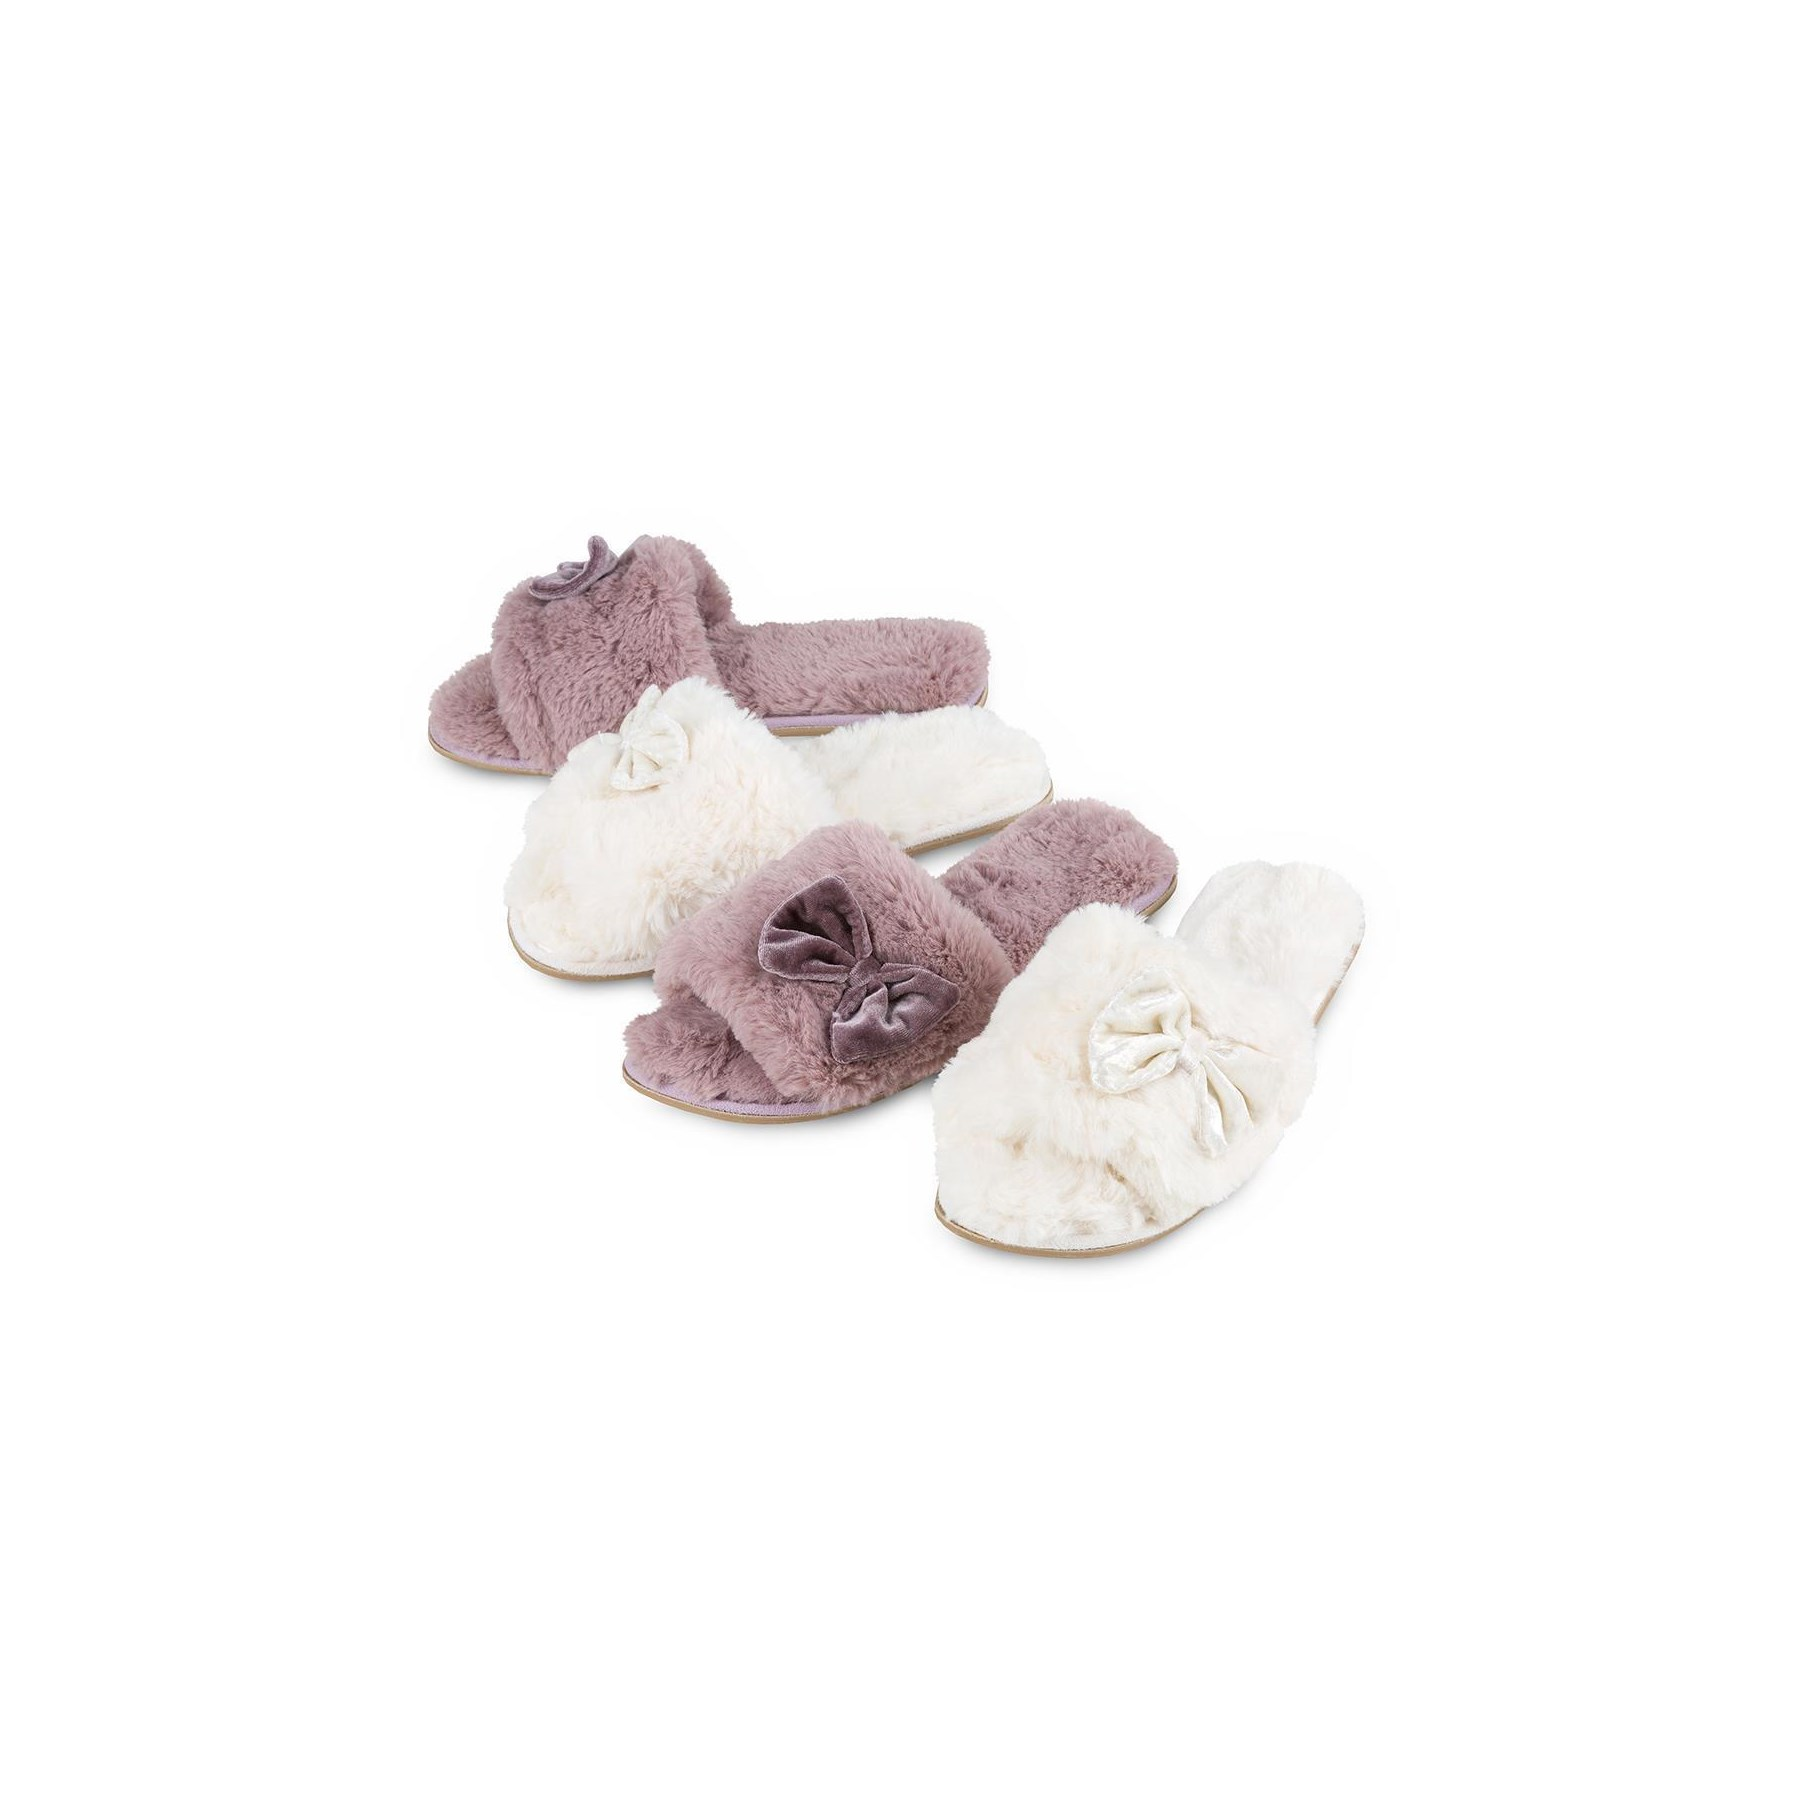 1273529b2 Totes Isotoner Ladies Textured Fur Open Toe Slippers Cream   Mink ...